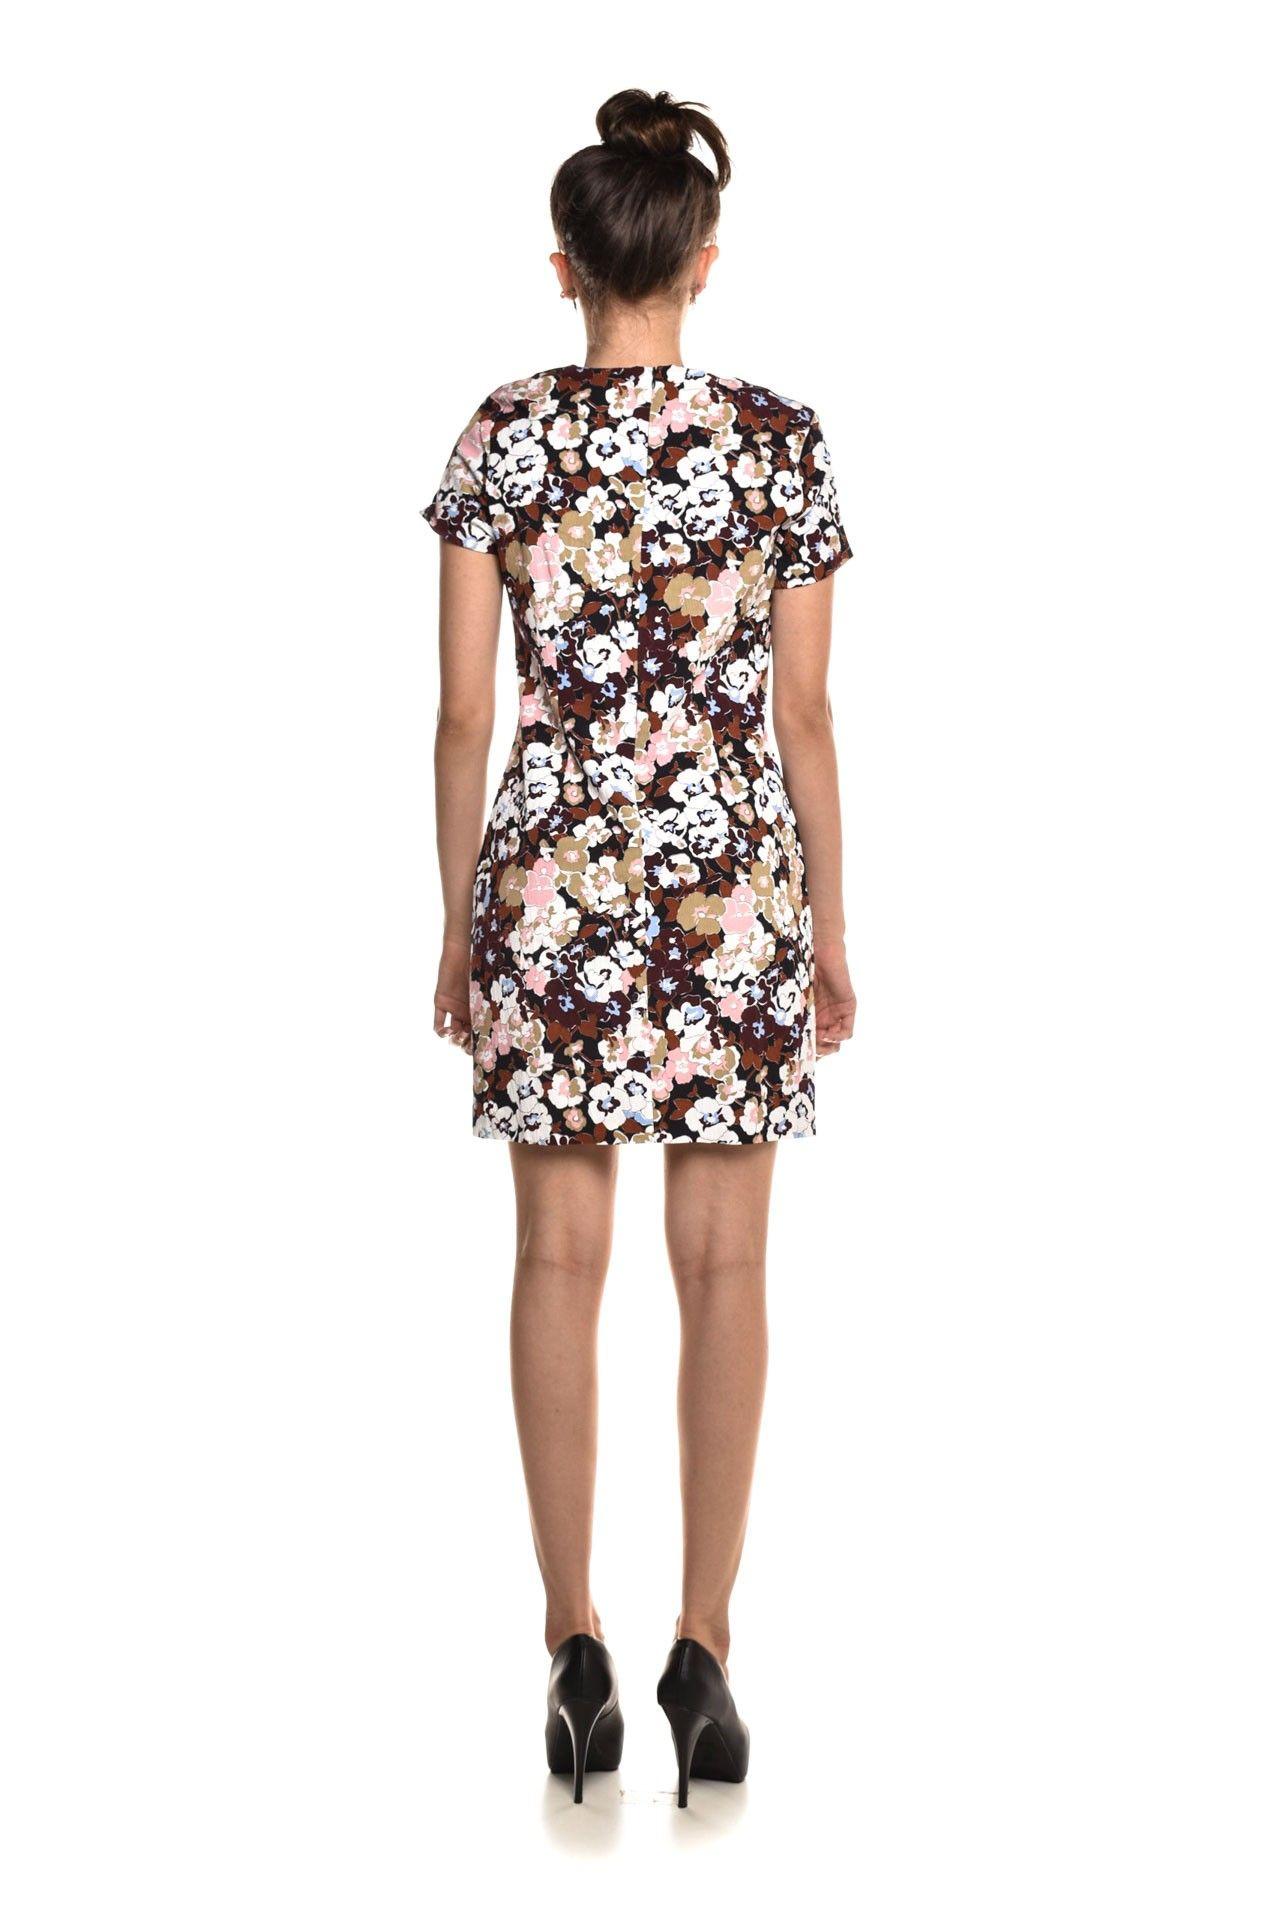 Gant - Vestido Floral Primavera - Foto 4